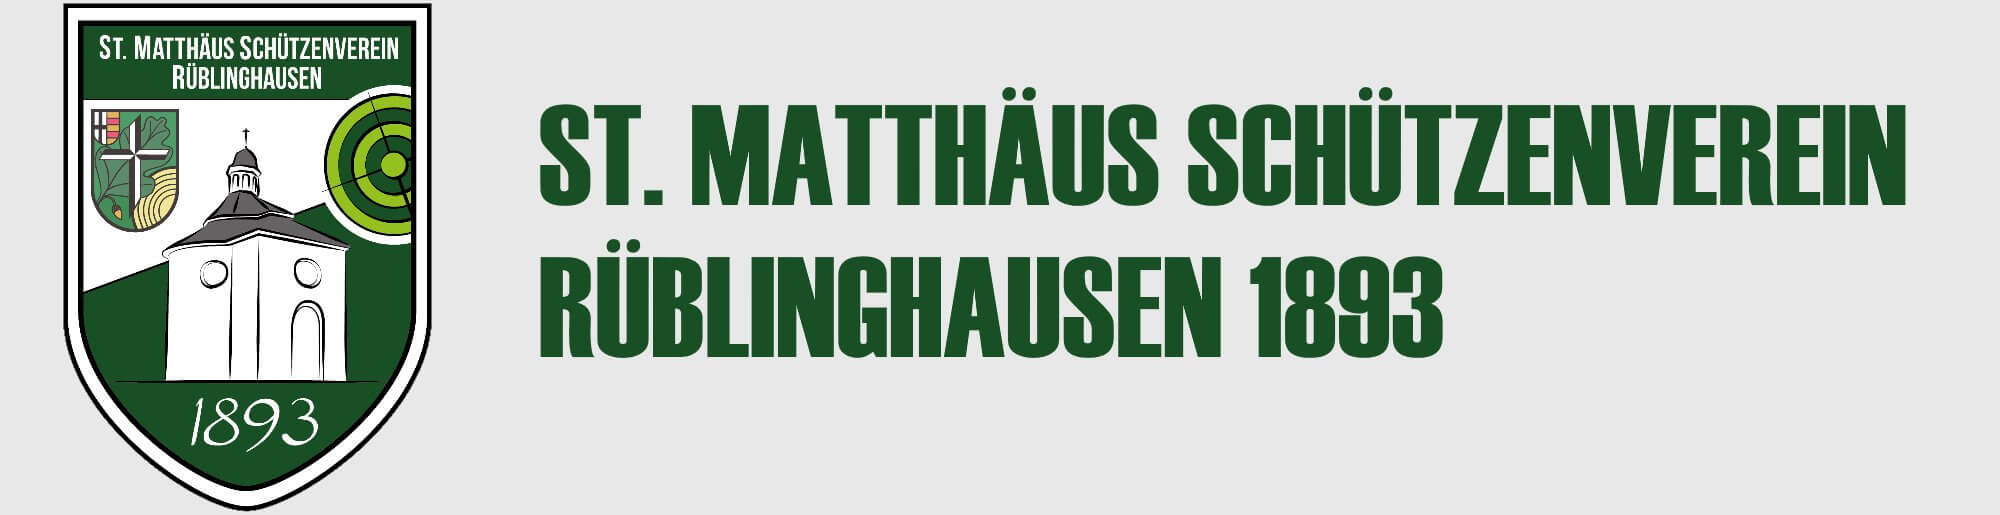 St. Matthaus Schützenverein Rüblinghausen 1893 e.V.